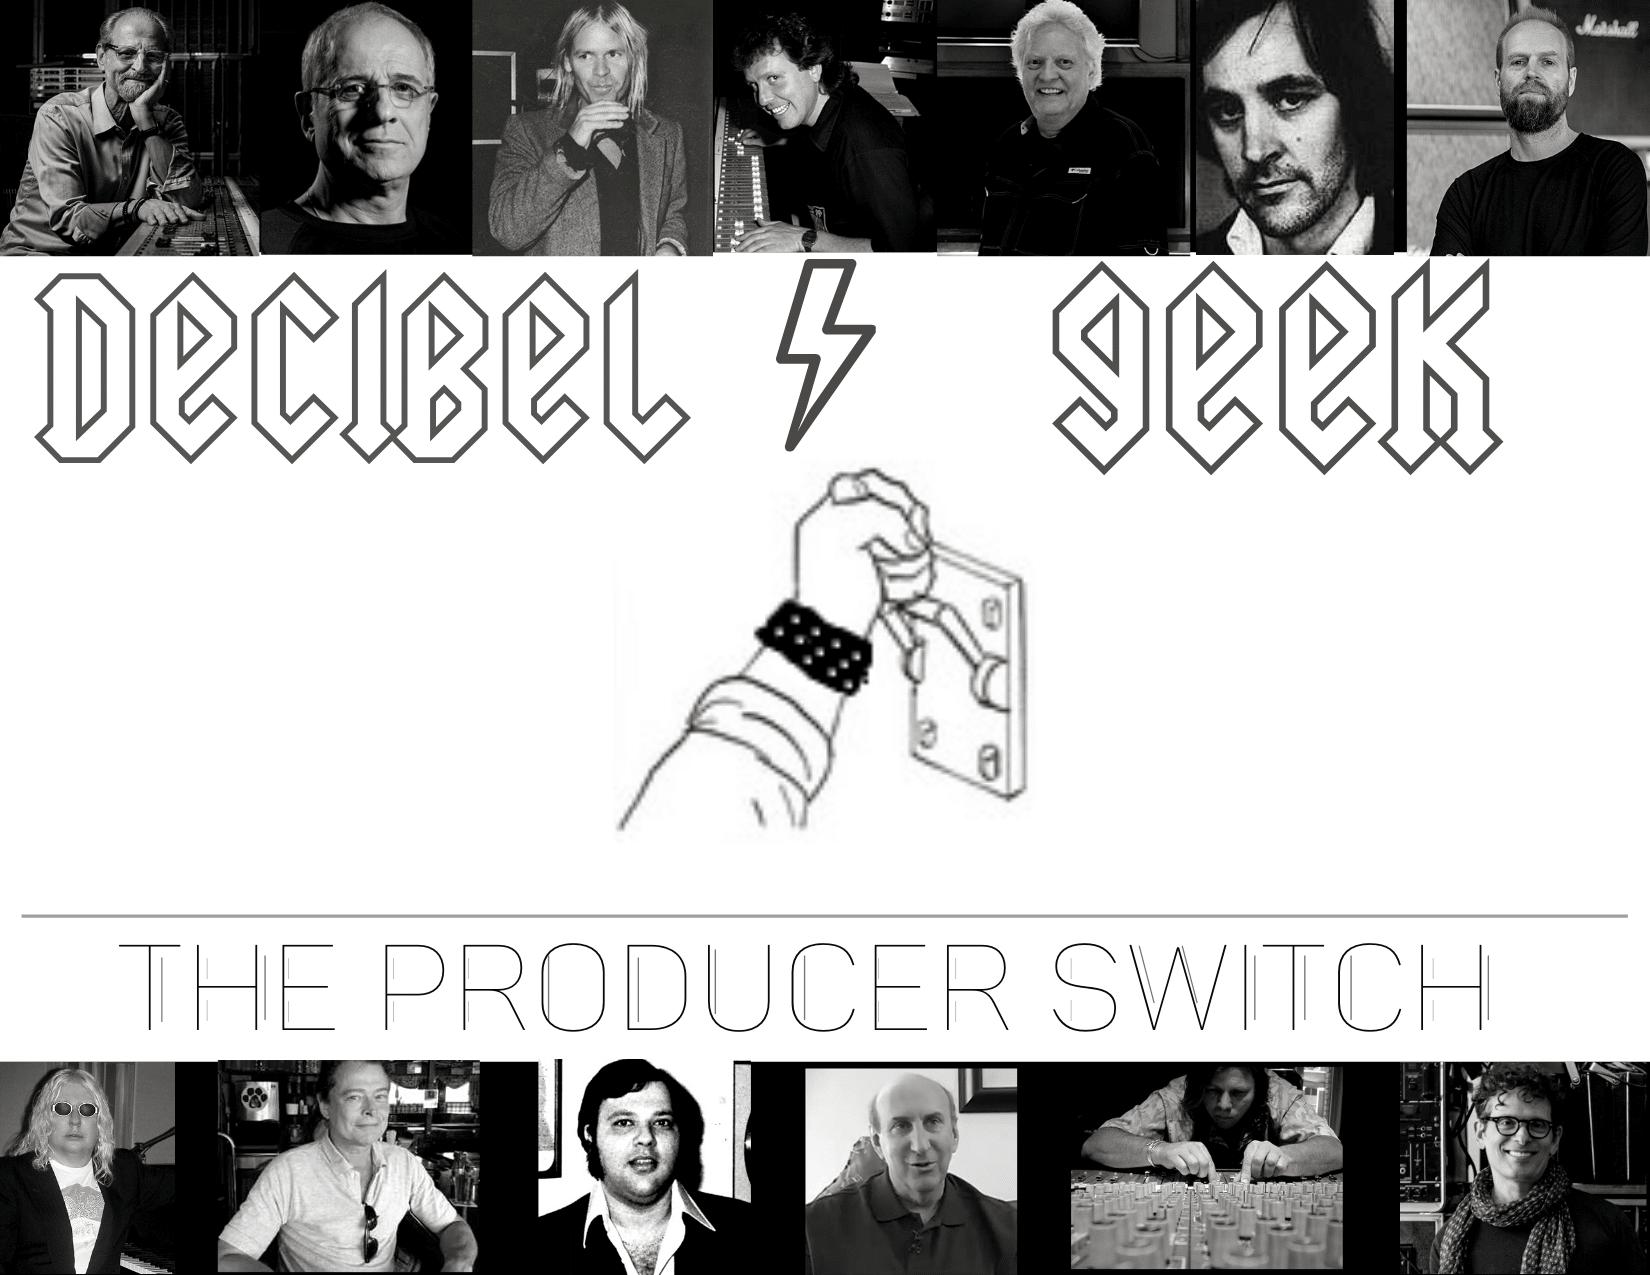 rock, metal, producer switch, decibel geek, podcast